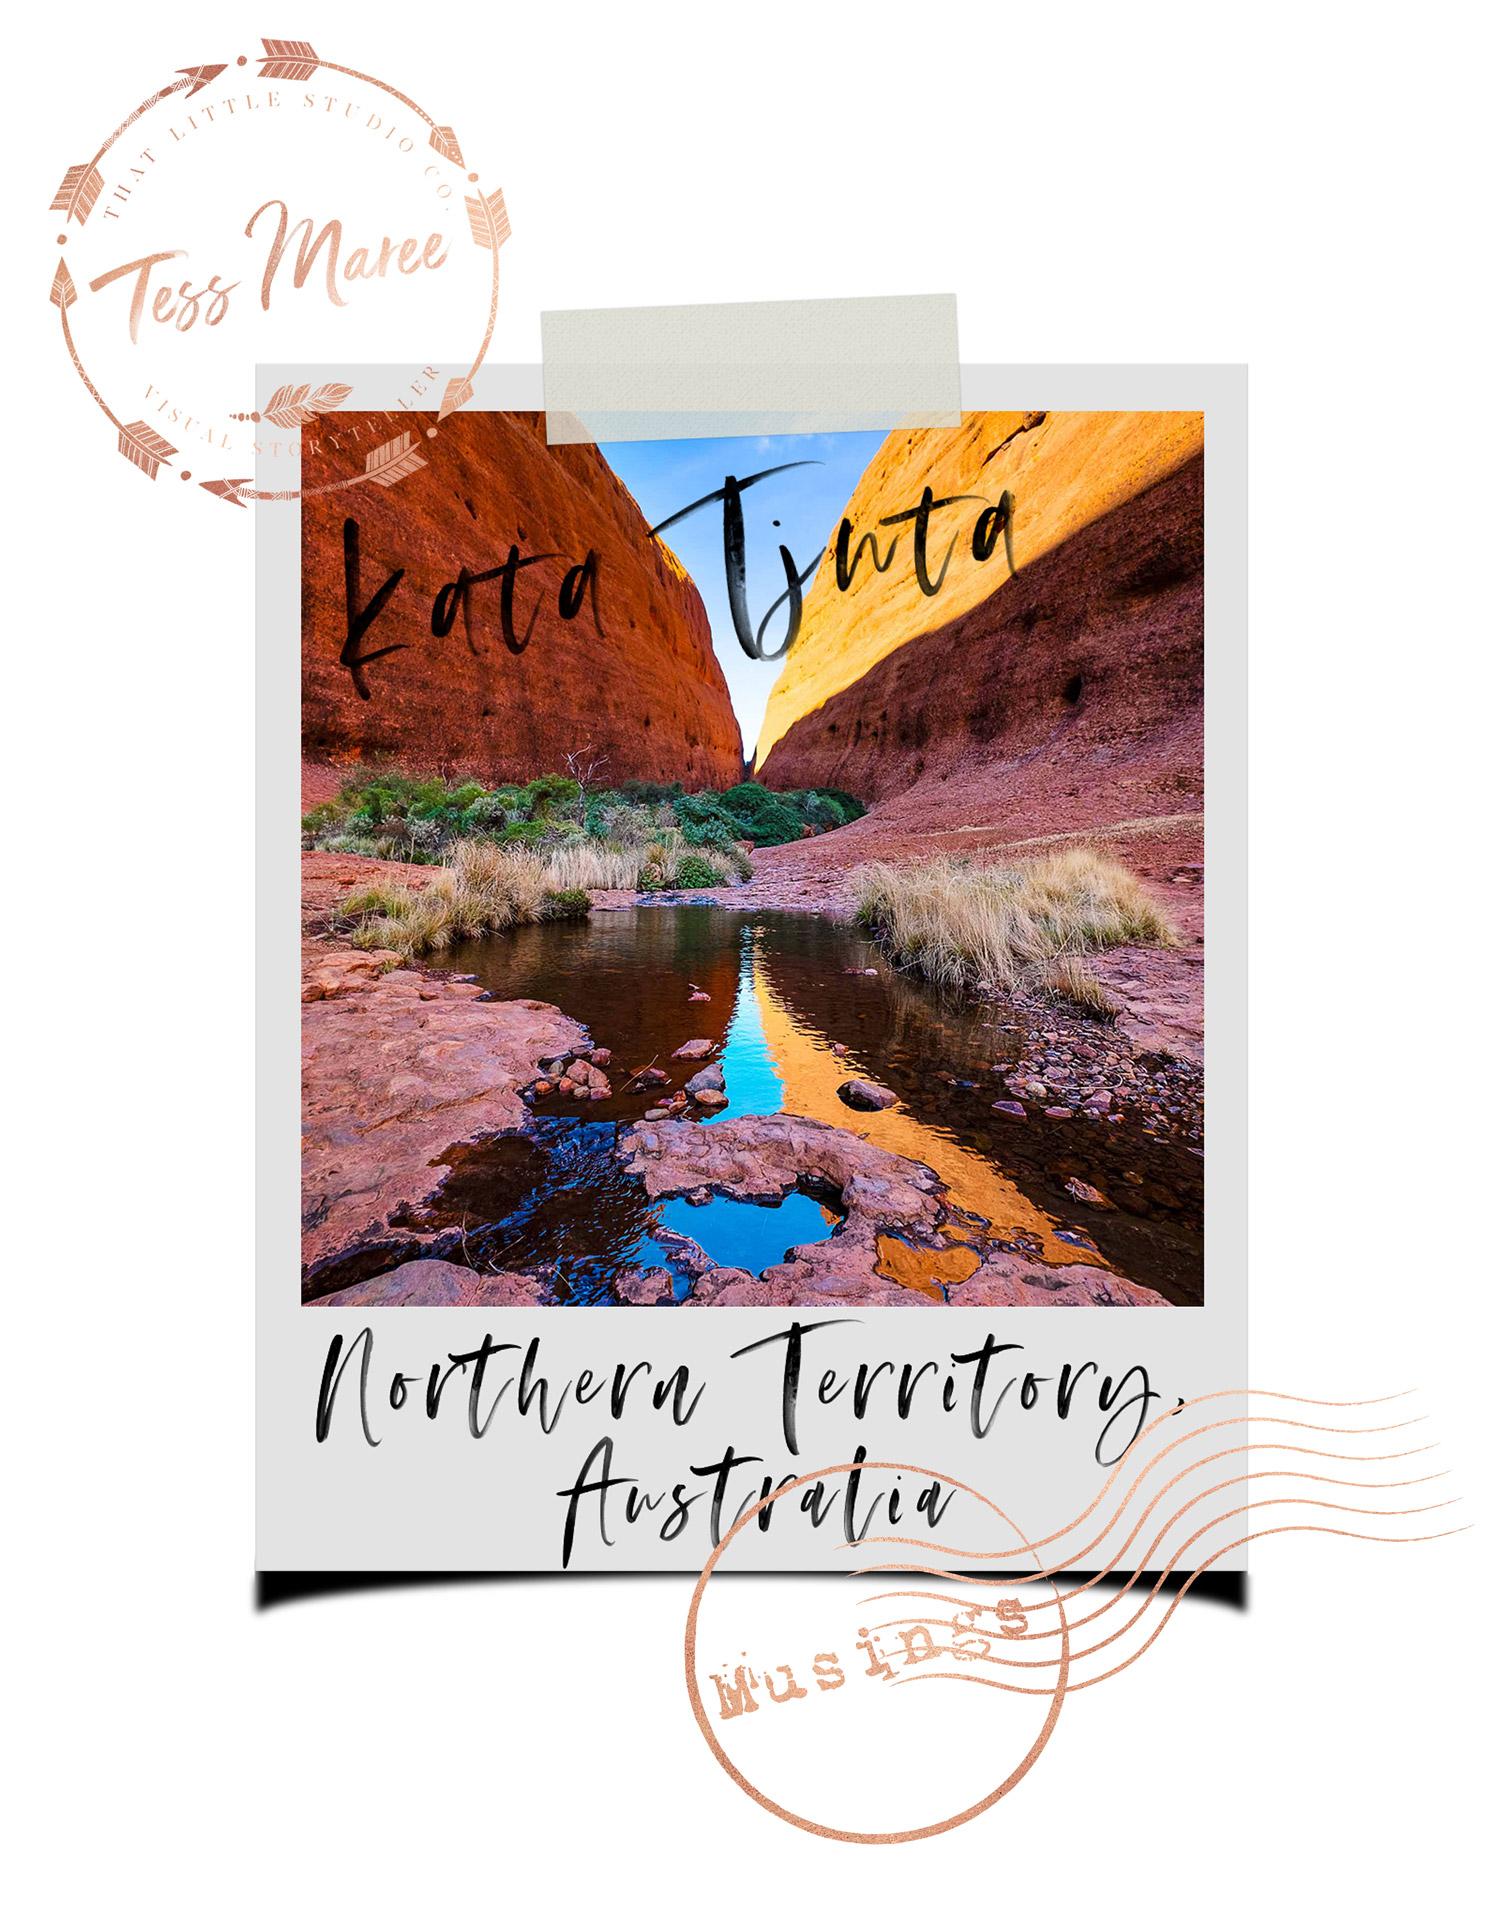 Tess-Maree-Musing-Kata-Tjuta-Northern-Territory-Australia-Polaroid